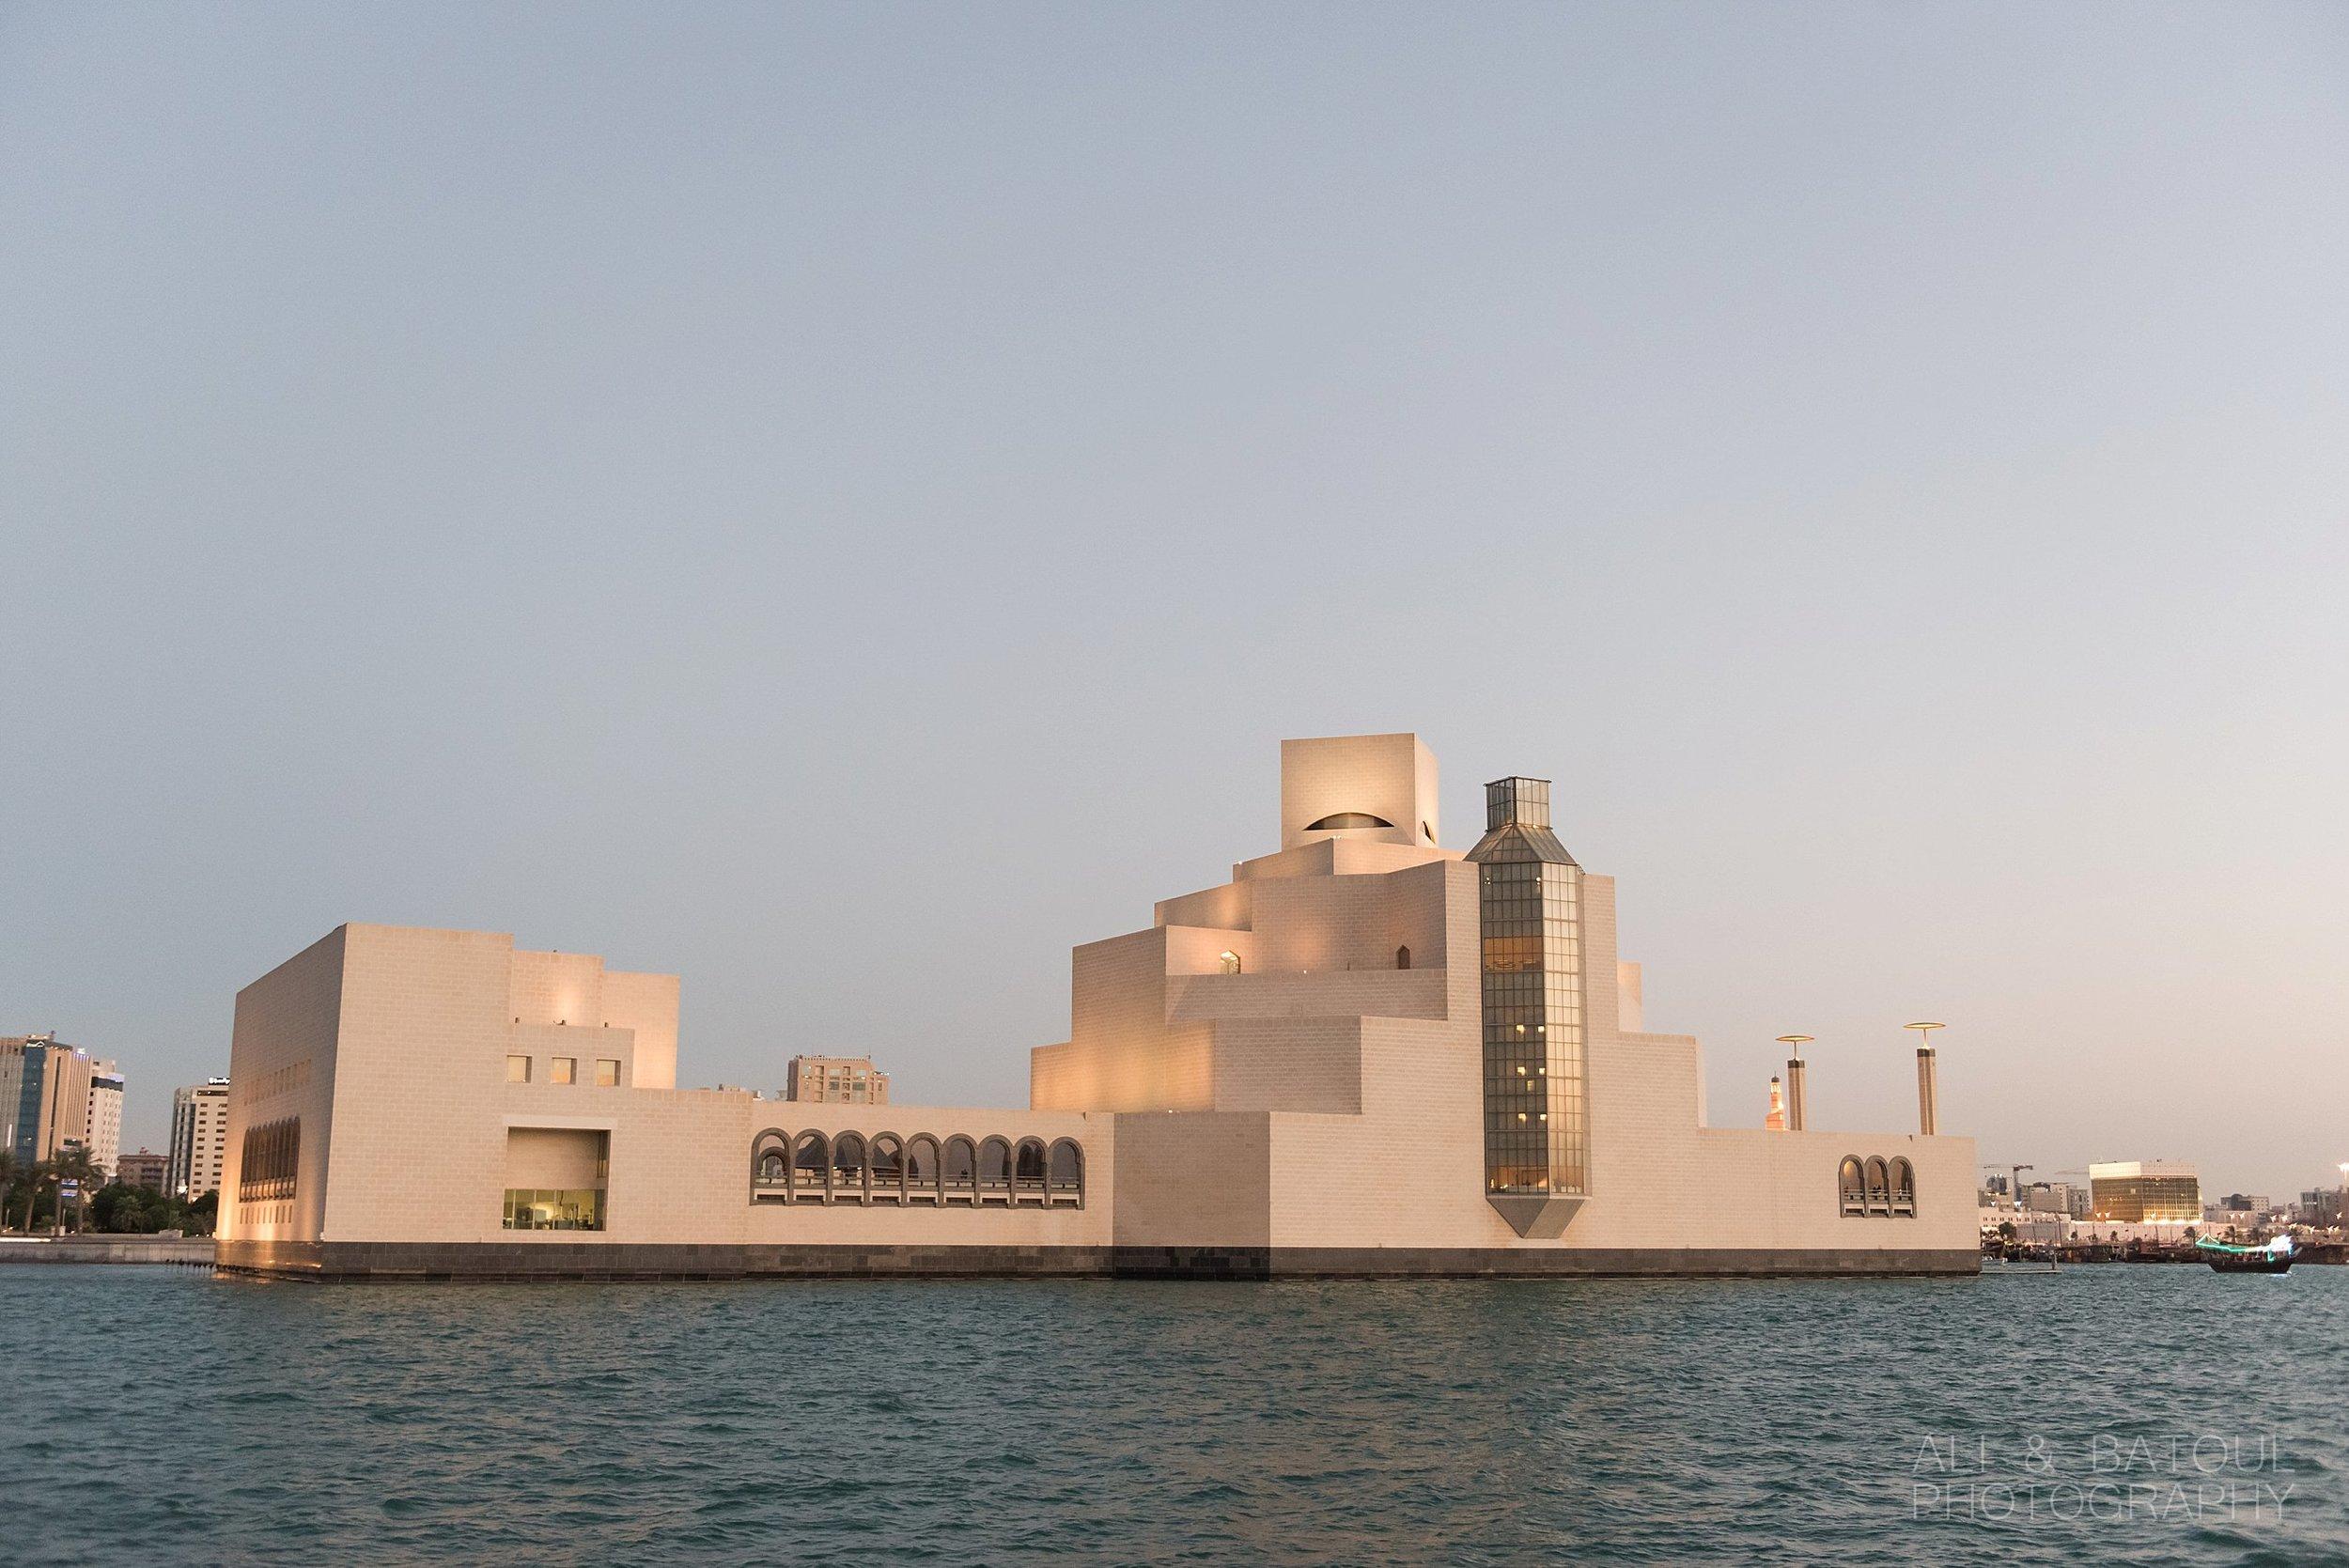 Ali & Batoul Photography - Doha Travel Photography_0055.jpg